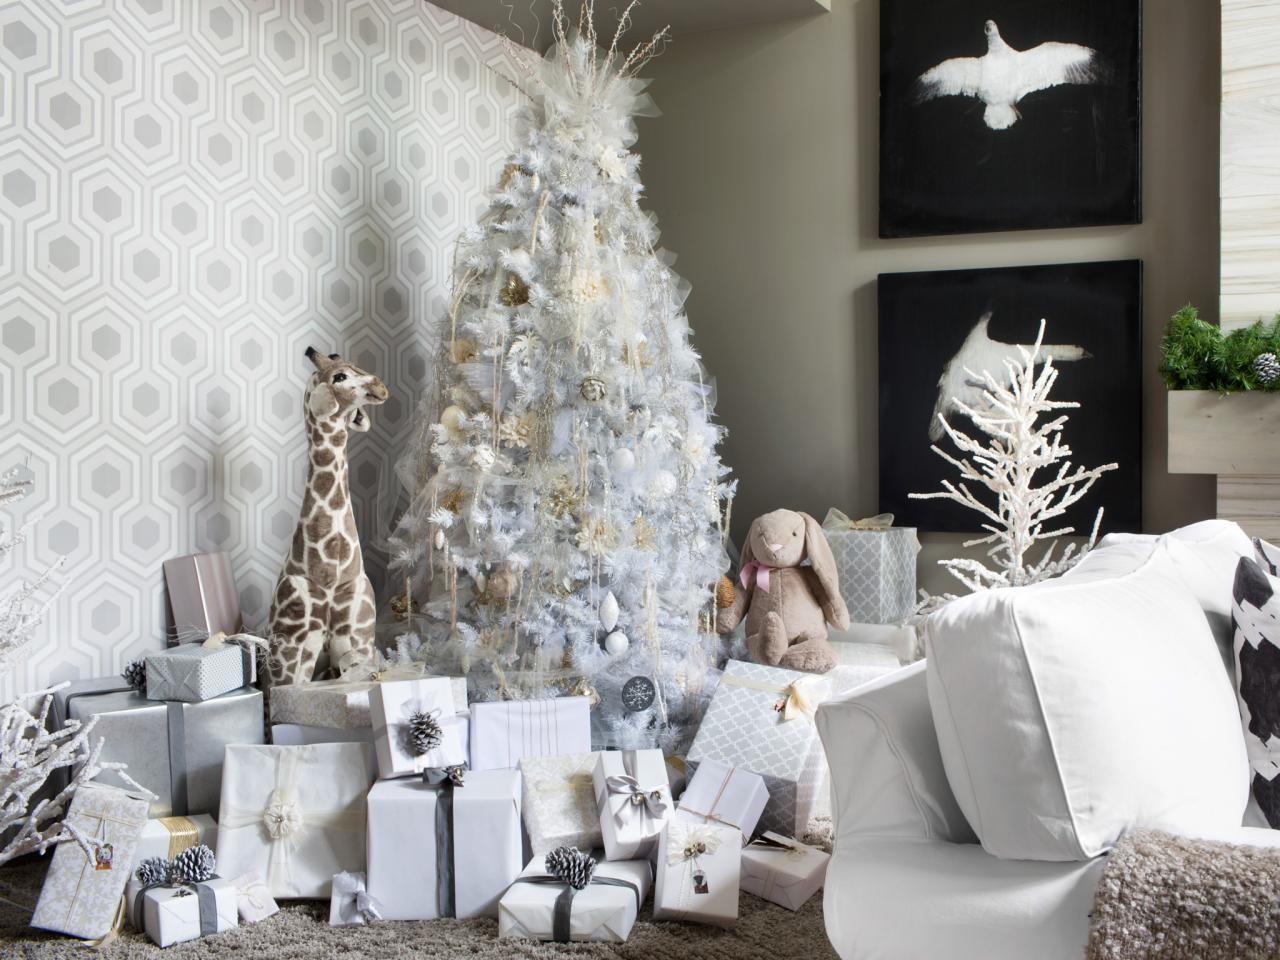 BPF_holiday-house_interior_all_white_christmas_tree_beauty_h.jpg.rend.hgtvcom.1280.960